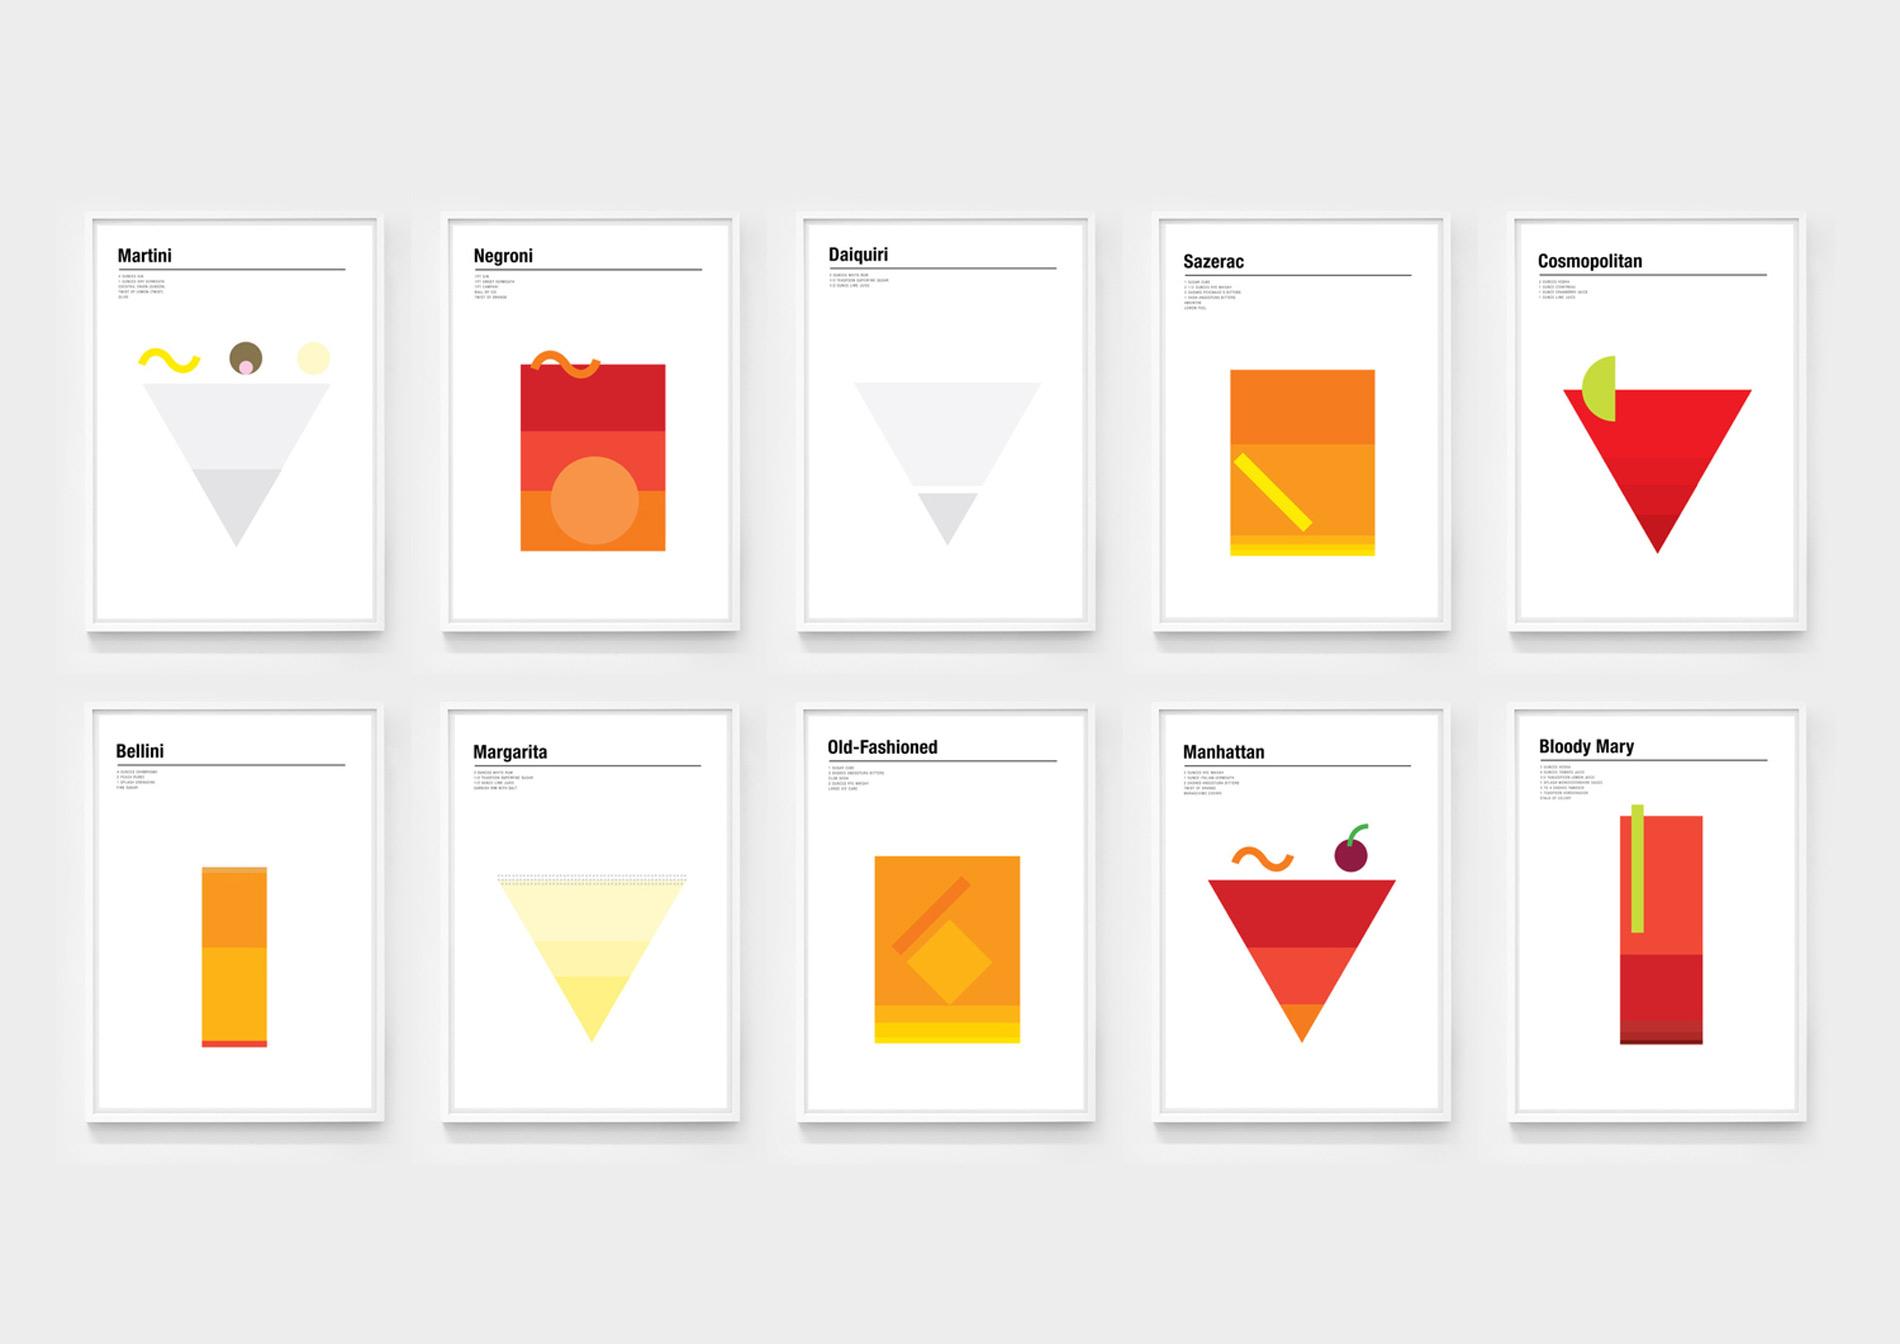 Mixología para amantes del diseño, o al revés